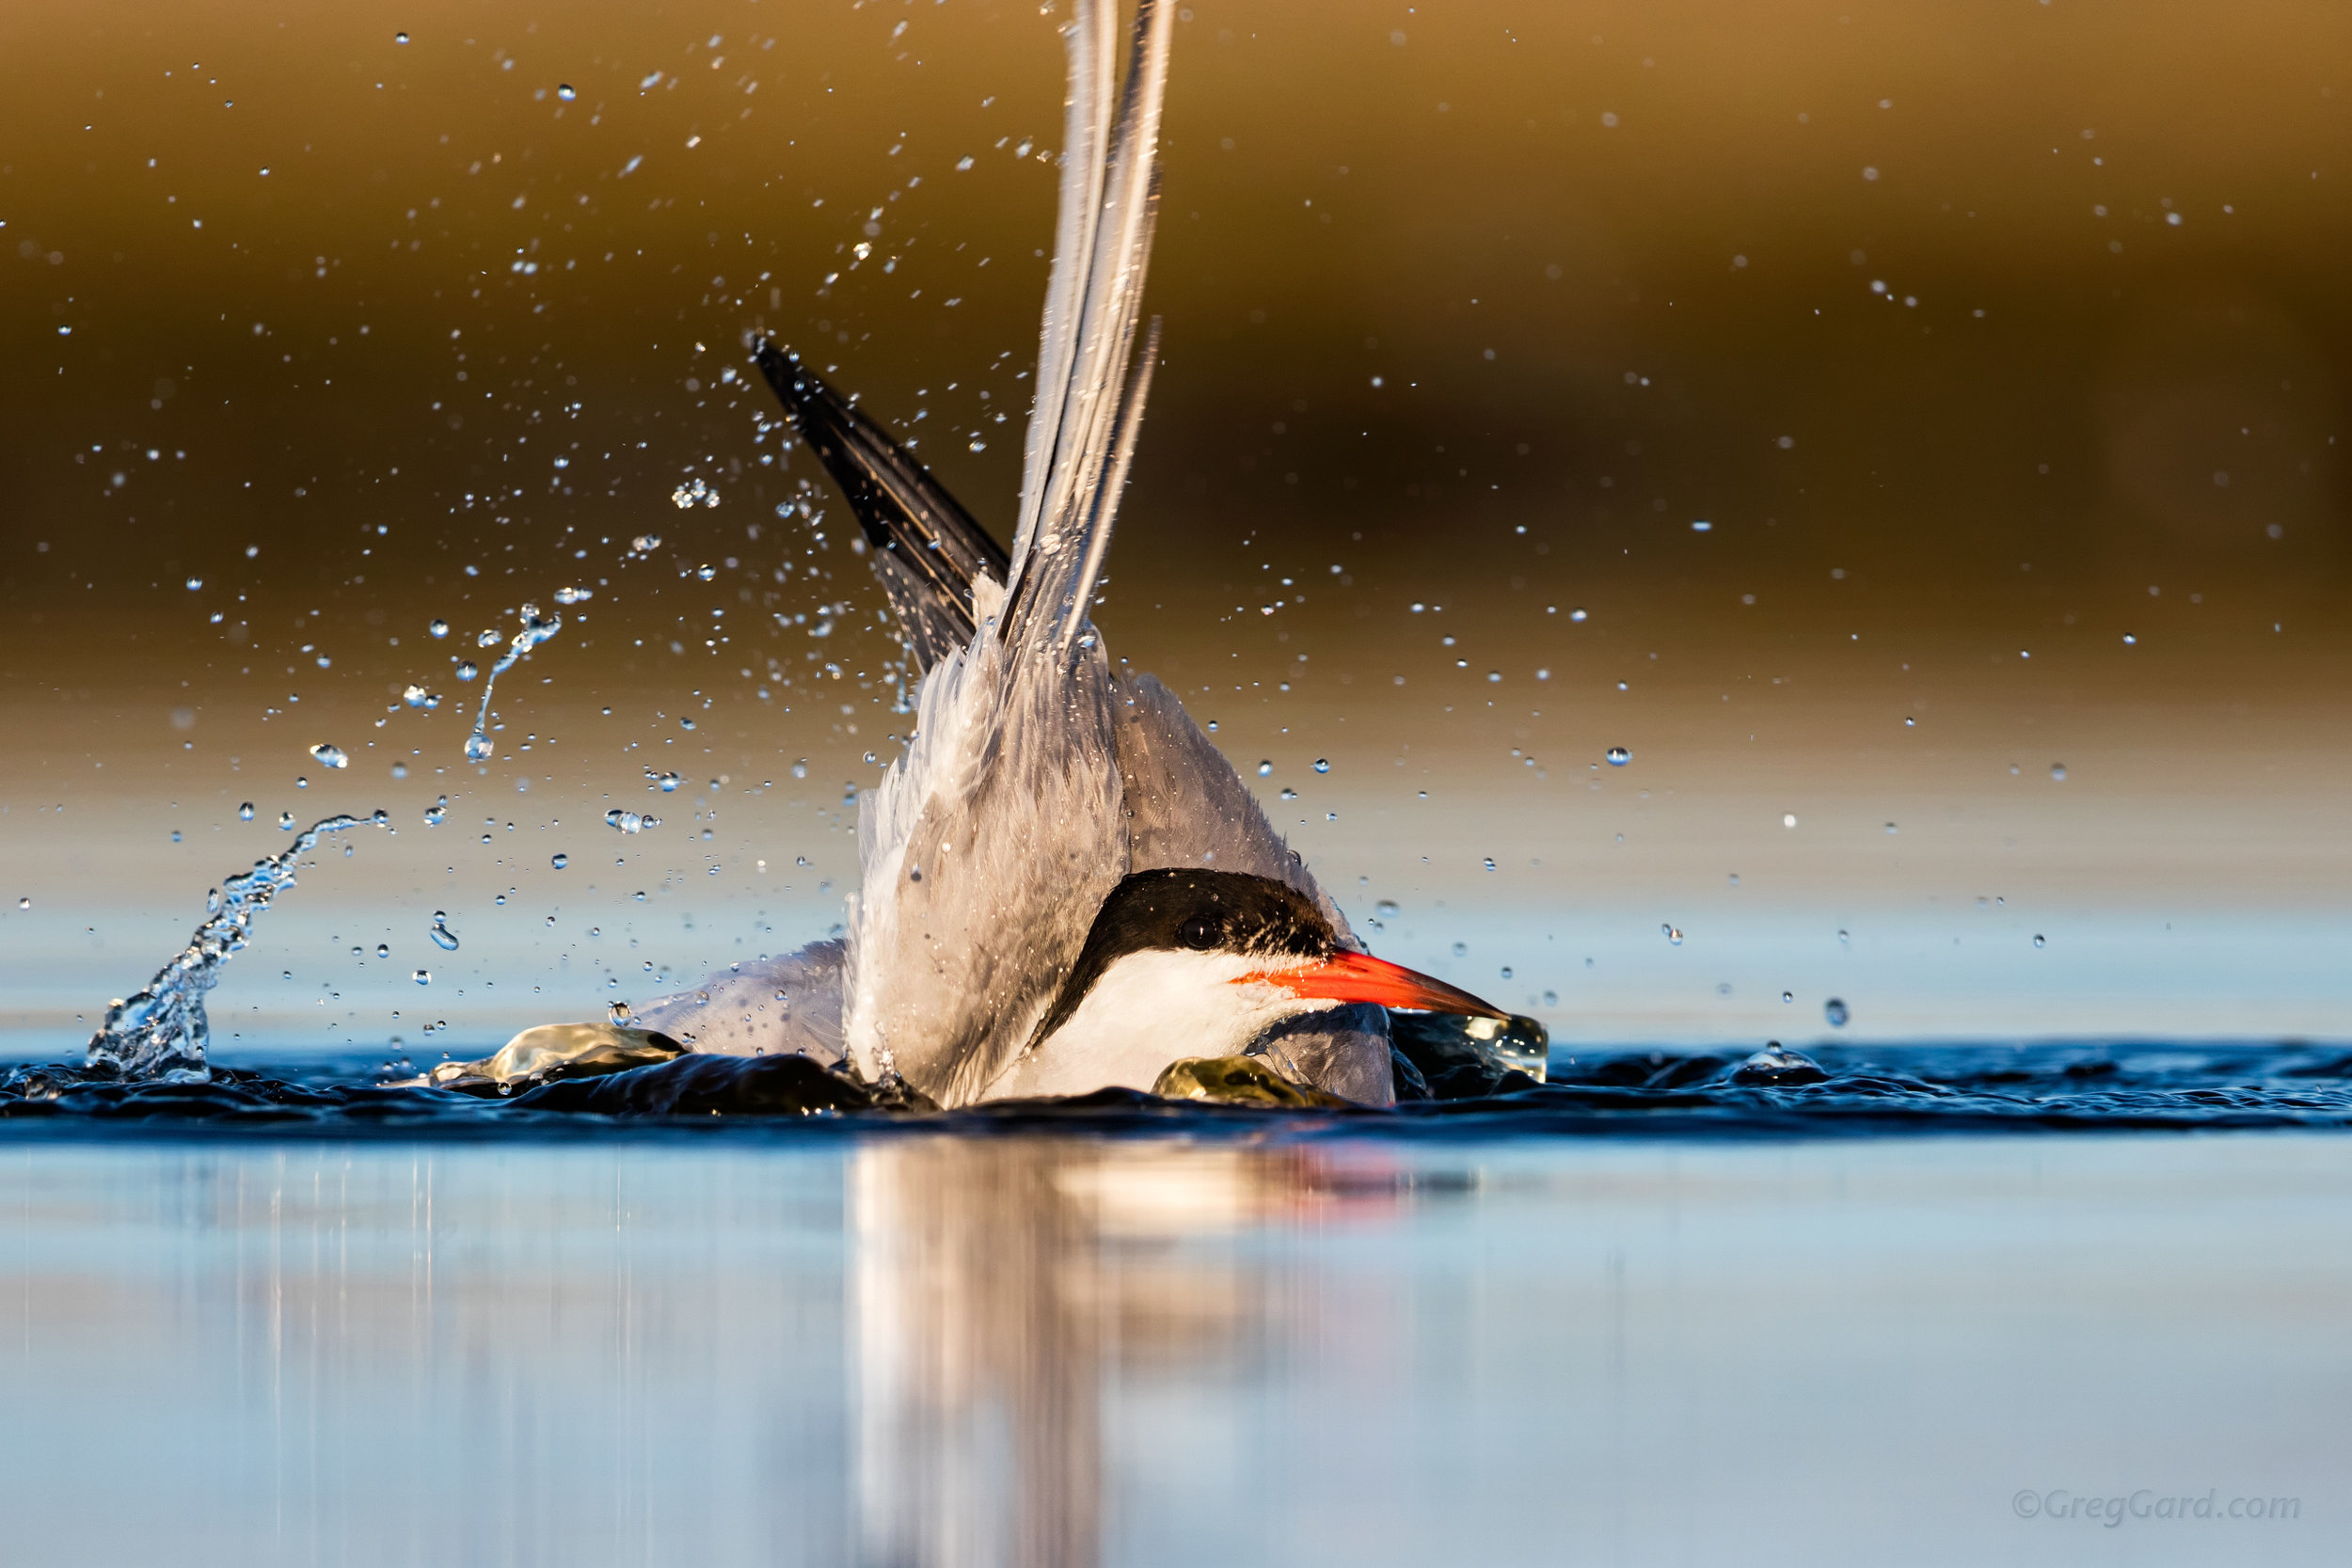 Common Tern taking a bath